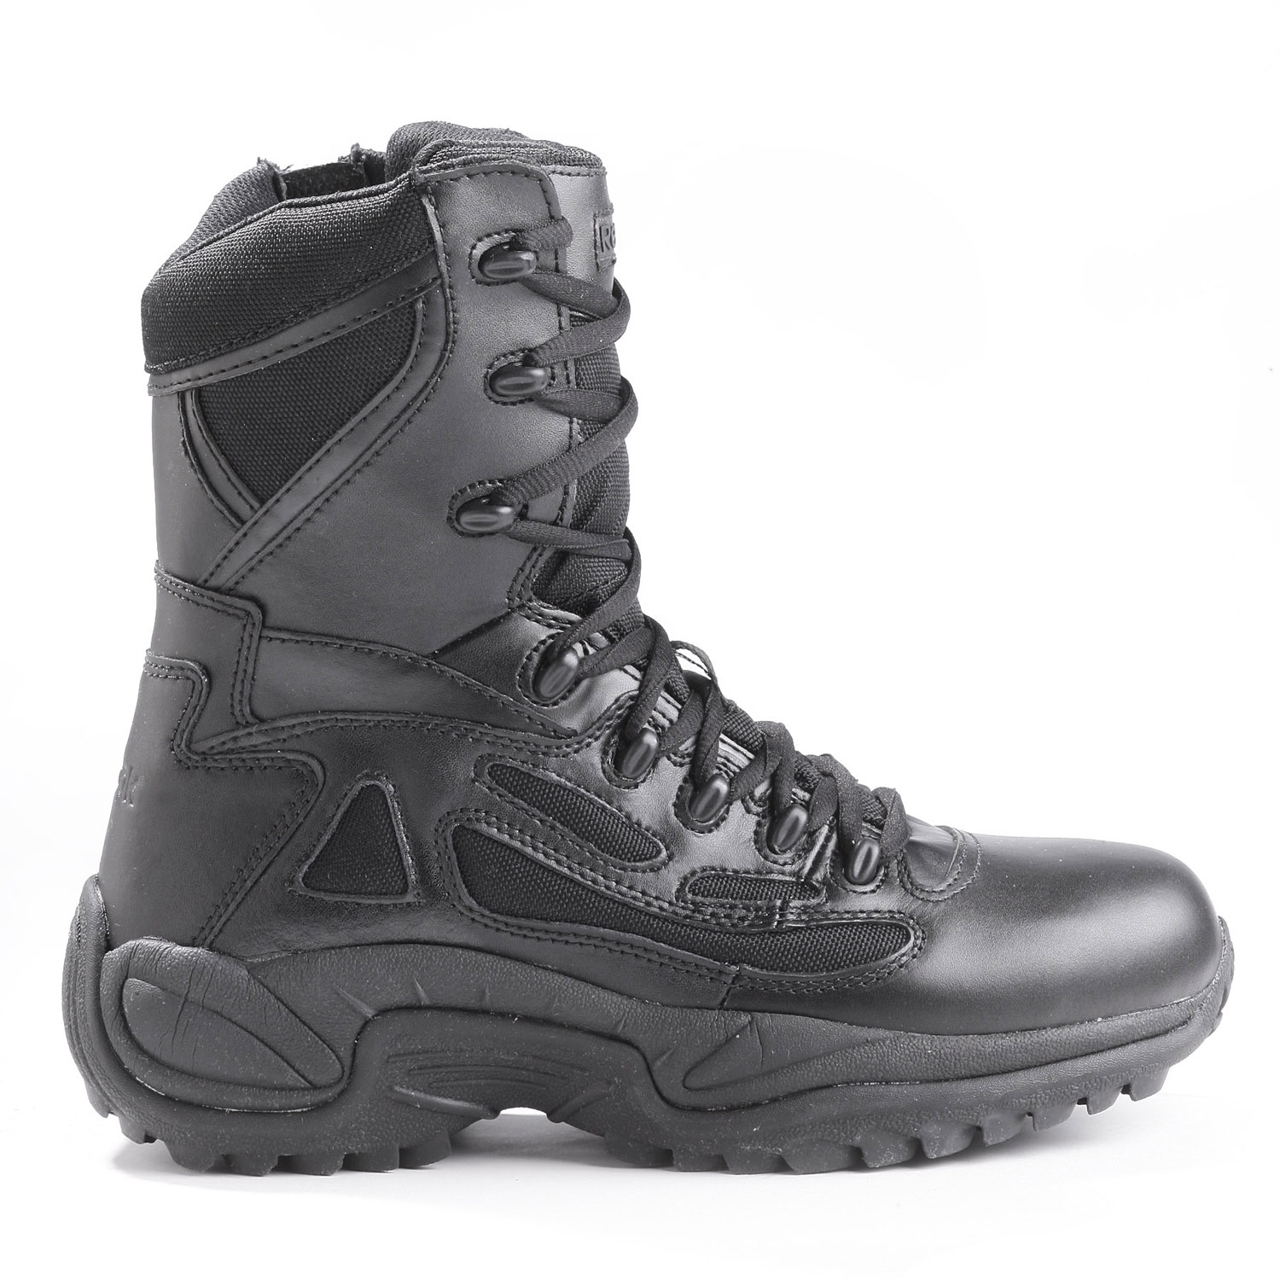 Reebok Womens 8 Rapid Response Side Zip Composite Toe Boot